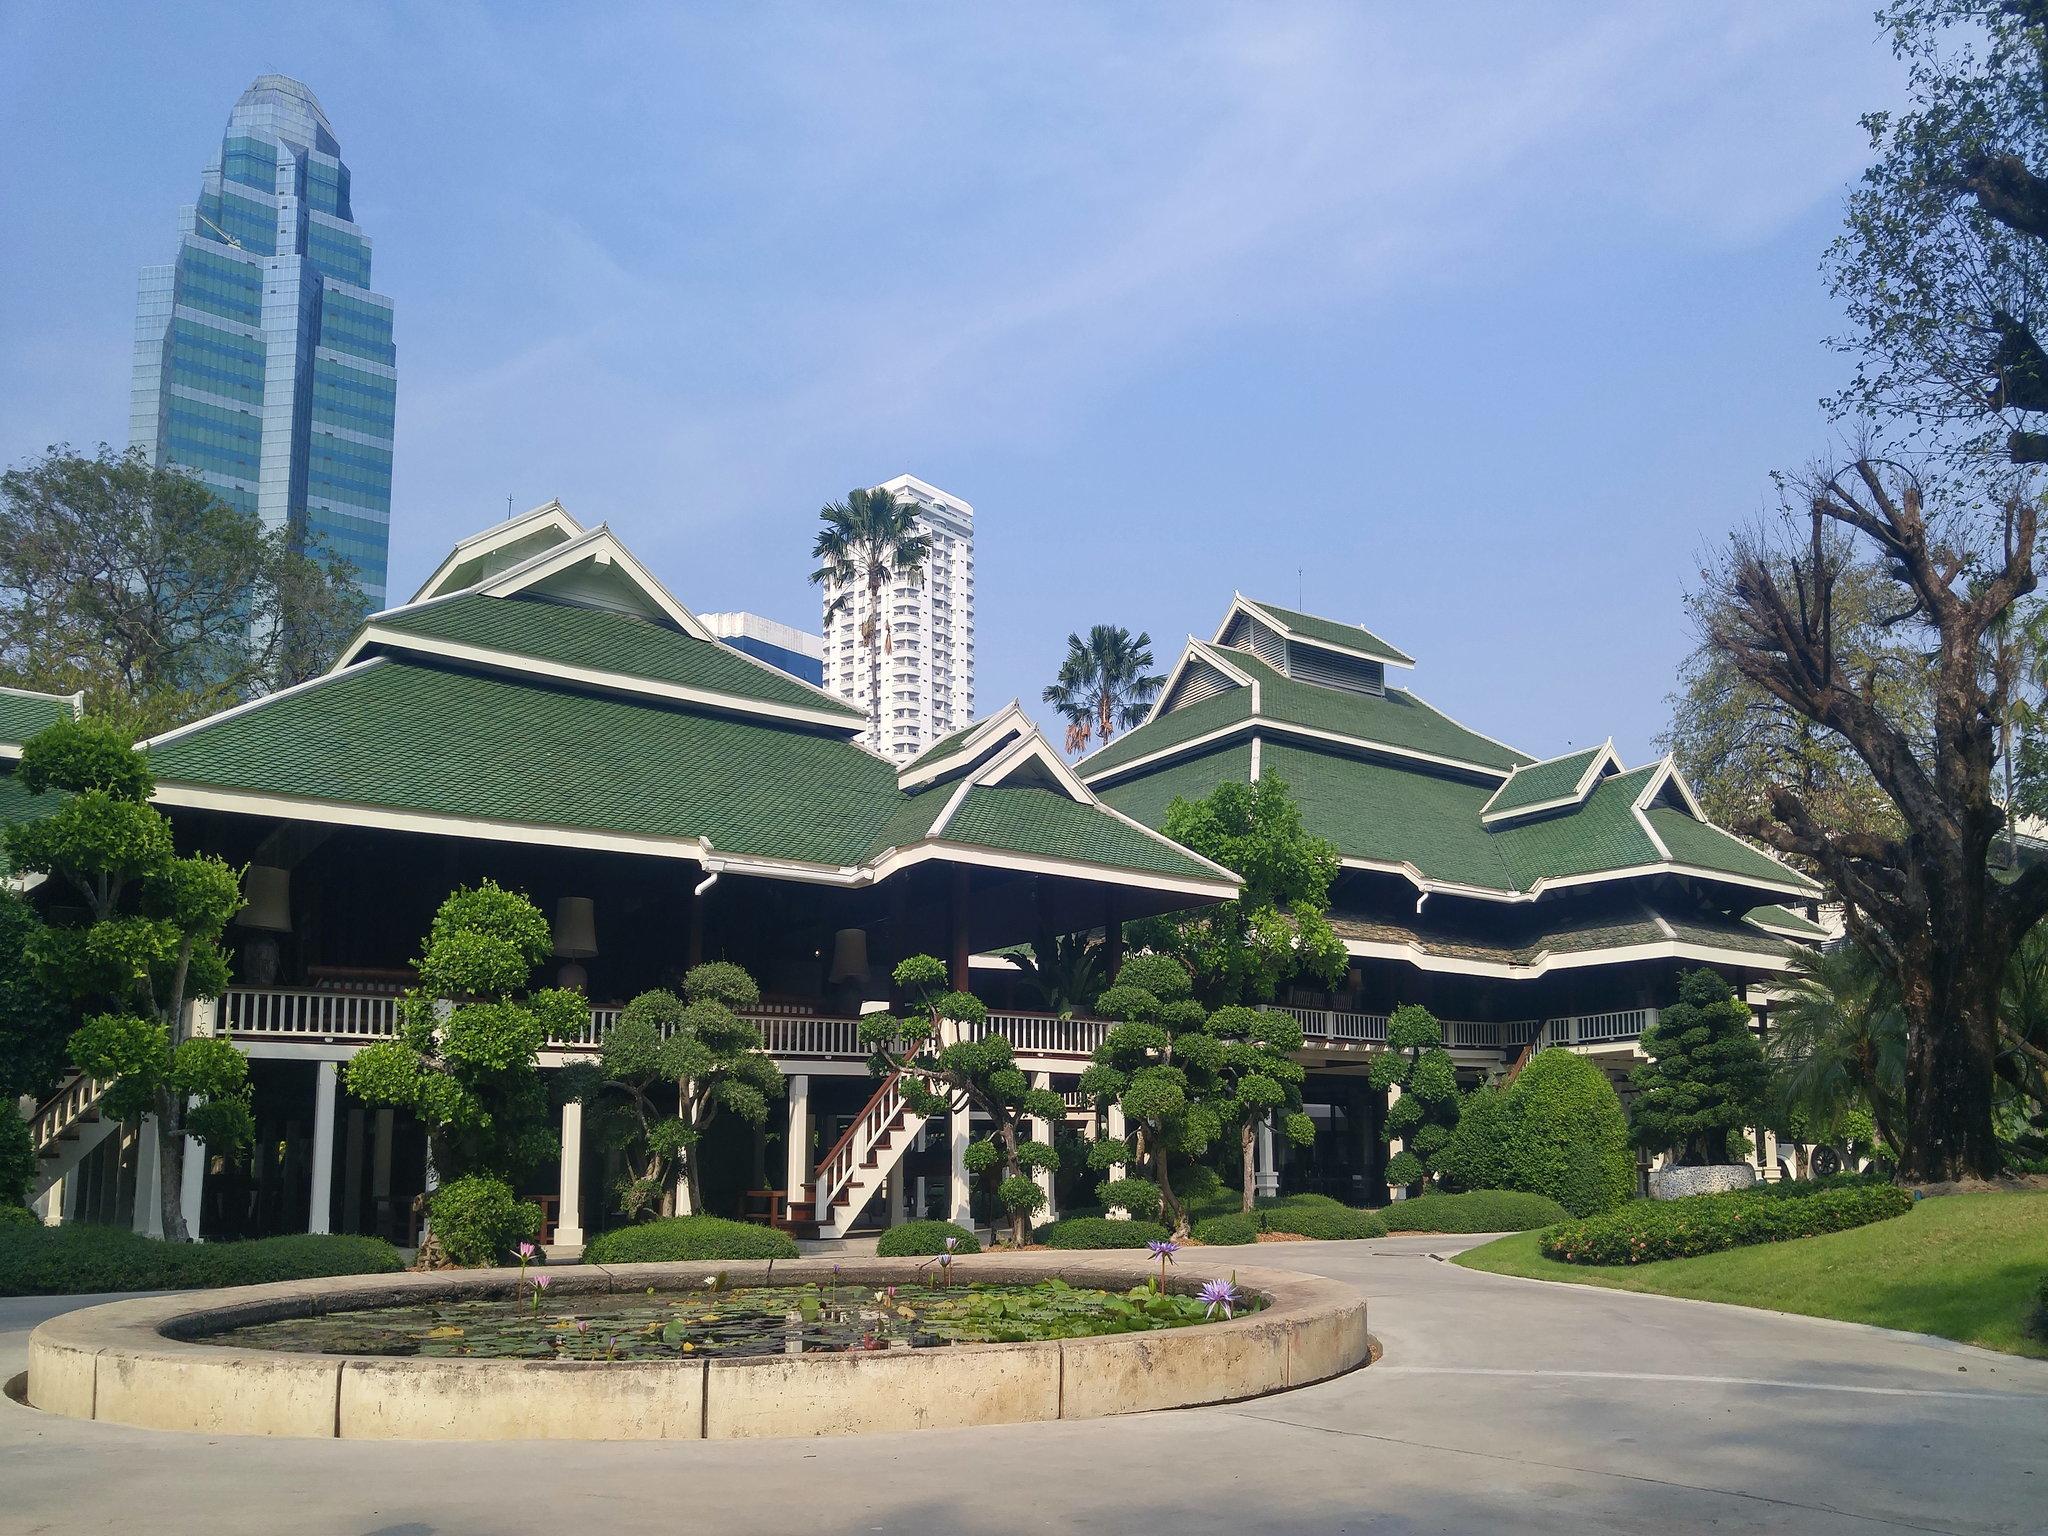 Nai Lert Park Heritage Home during daytime